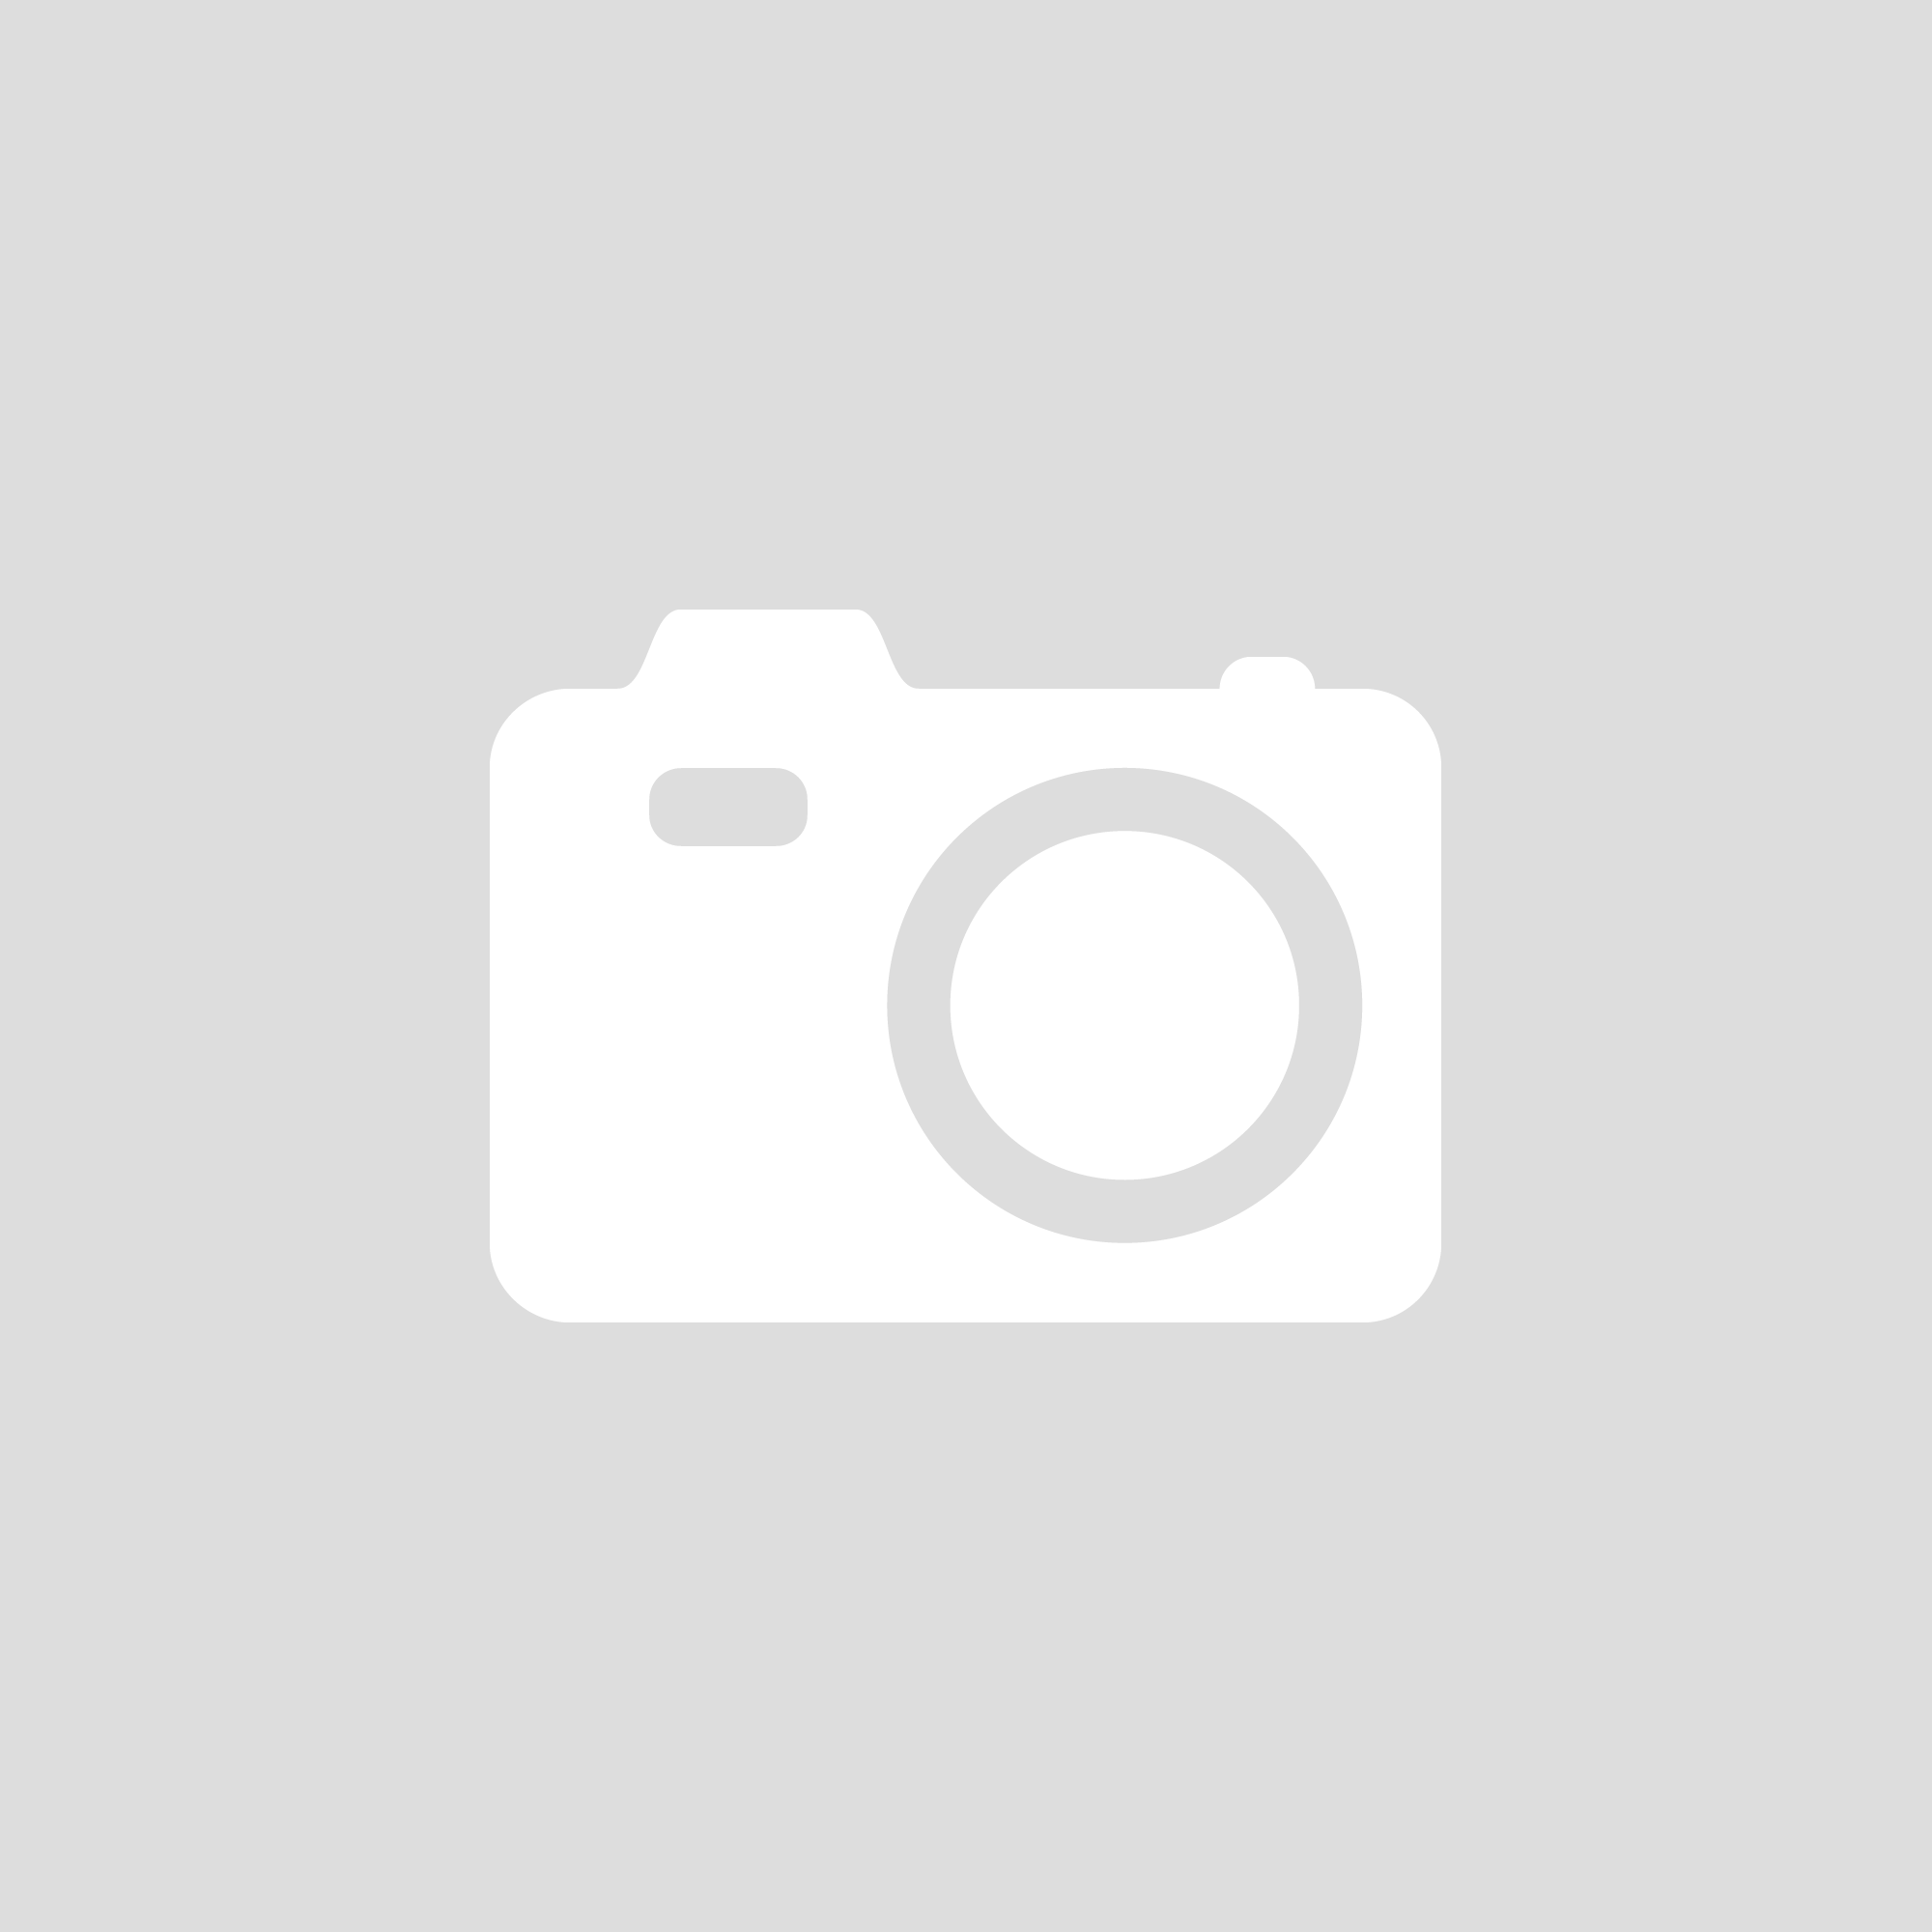 Kimi Amethyst Emblem Wallpaper by Crown M0707